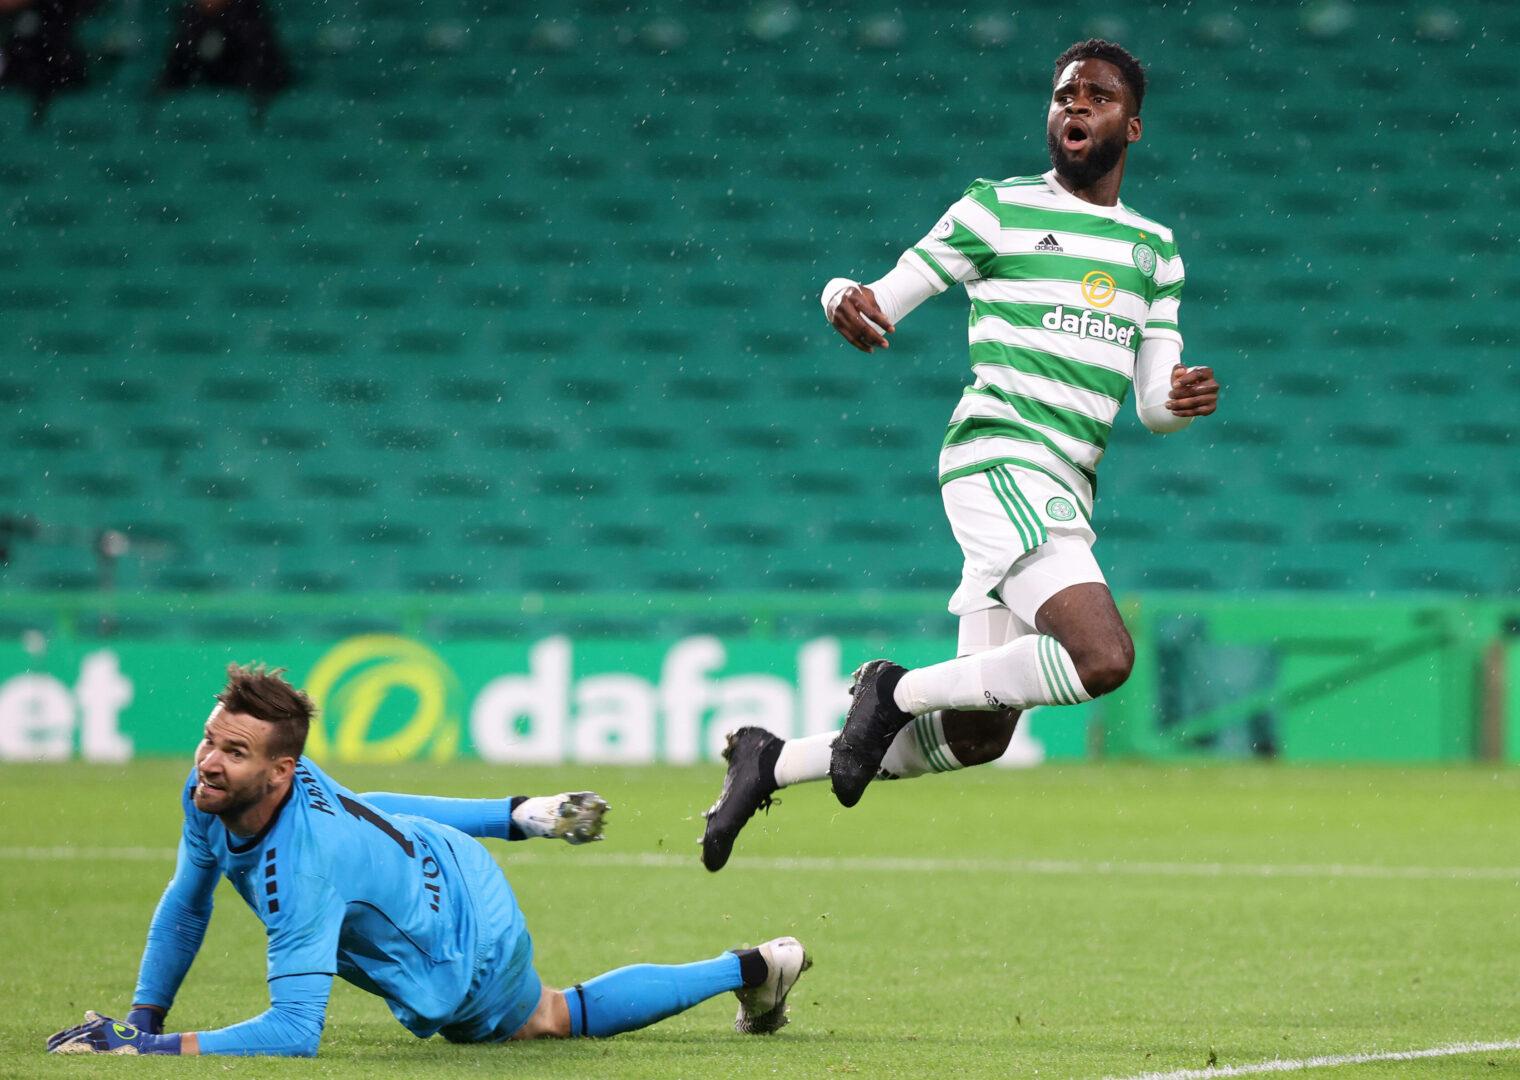 Celtic-Stürmer Edouard hebt den Ball über den Torhüter